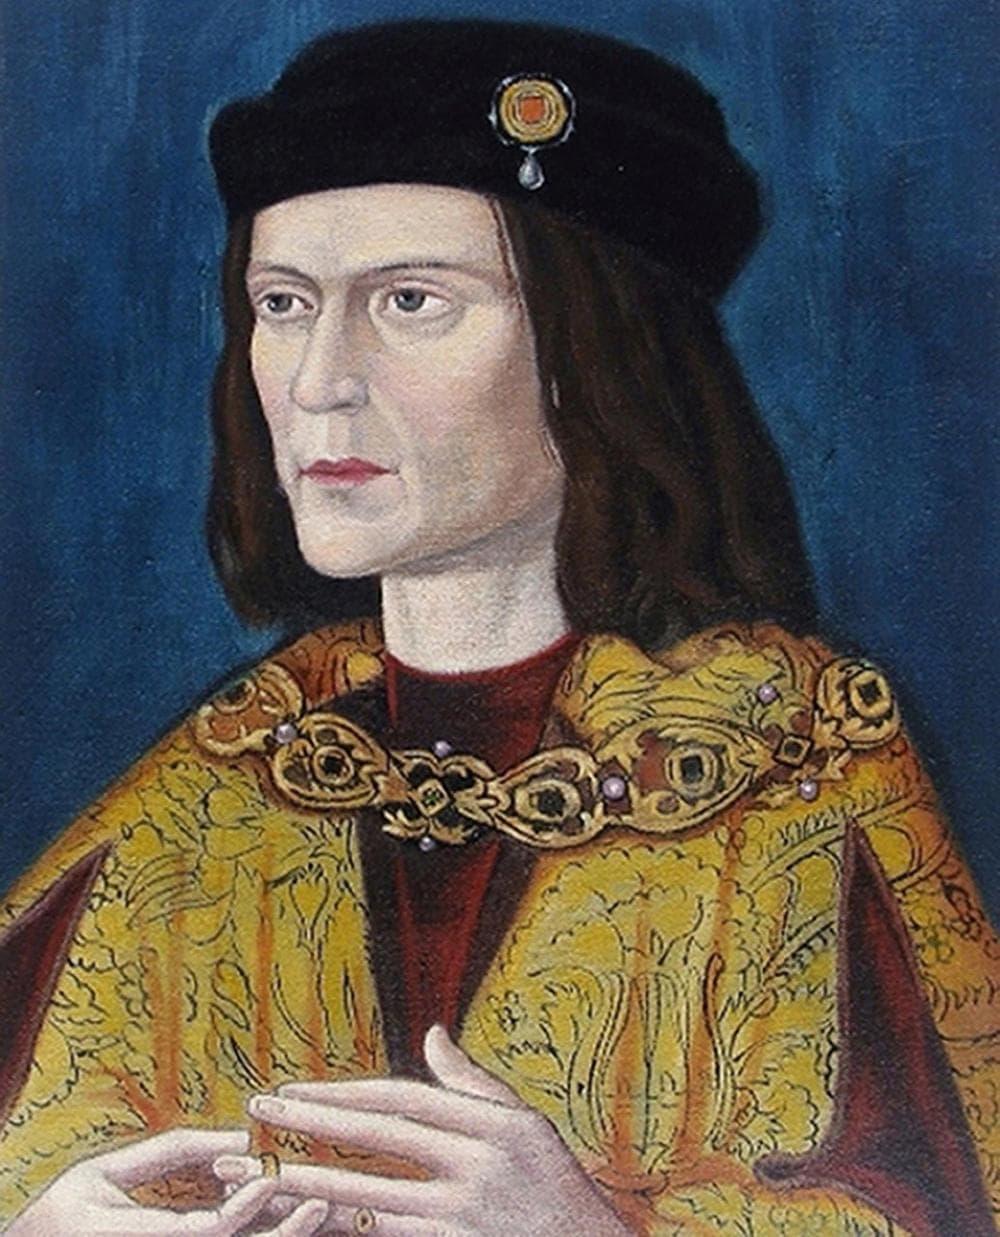 The earliest surviving portrait of Richard III. (AP)